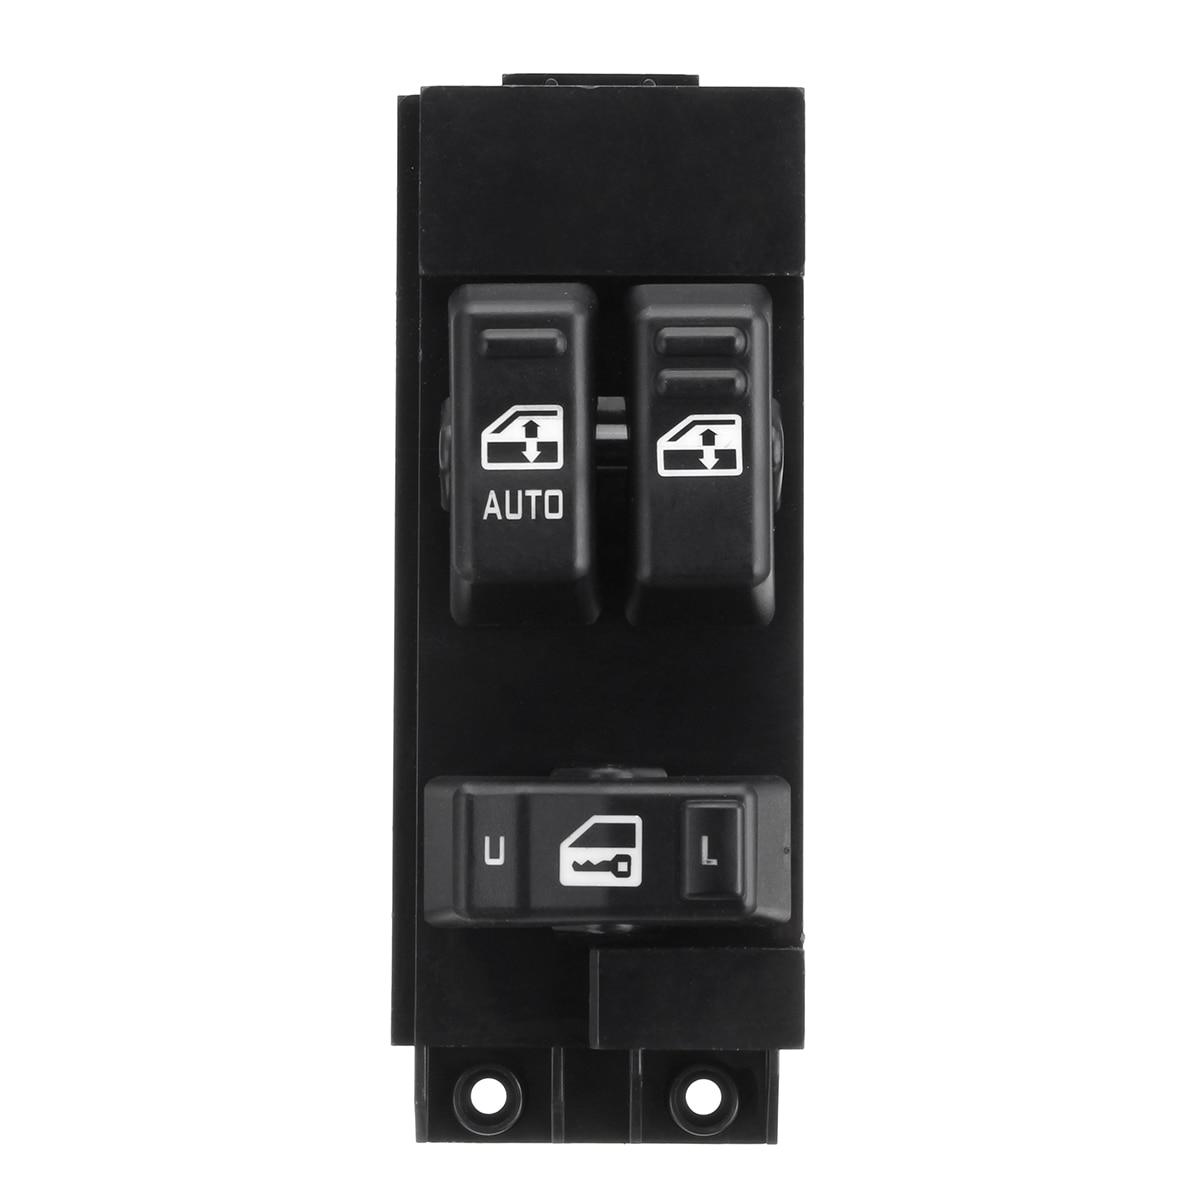 #15054161 #5753934 Abs Driver Side Electric Power Window Switch For Chevrolet/gmc Silverado Sierra 1500 2500 Hd 3500 2001 2002